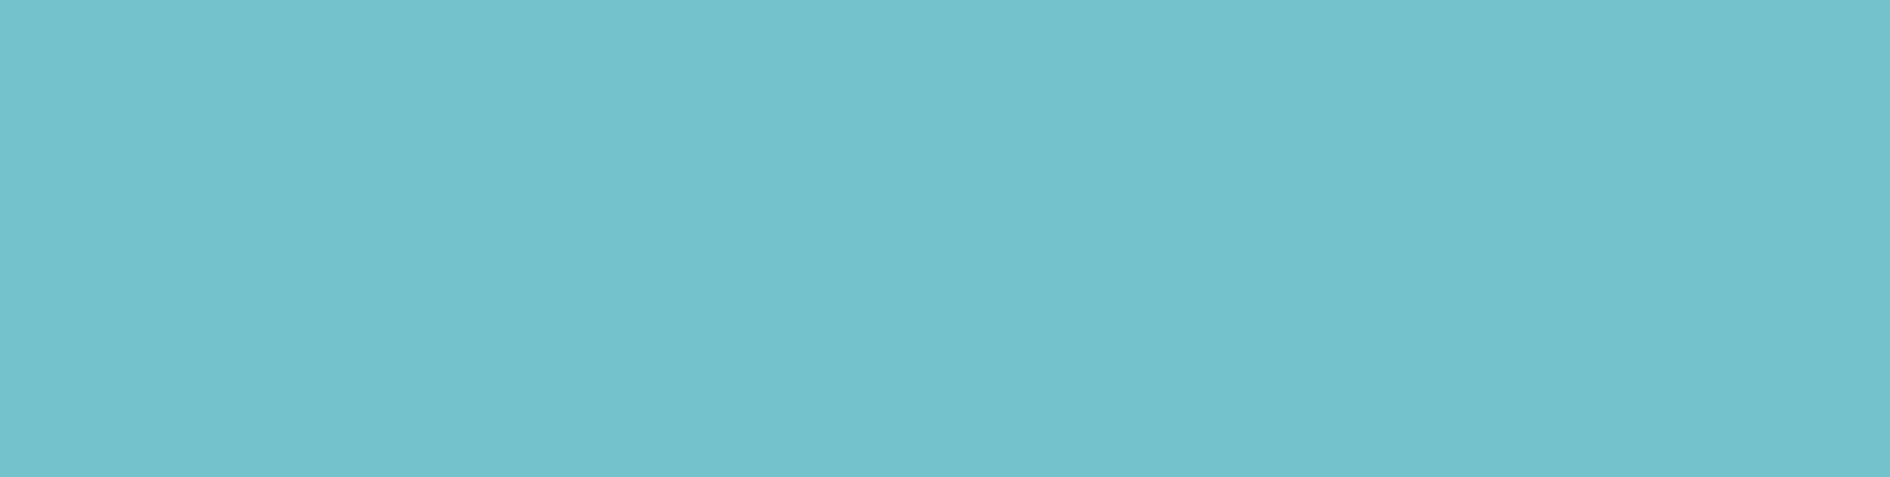 Blue block-a